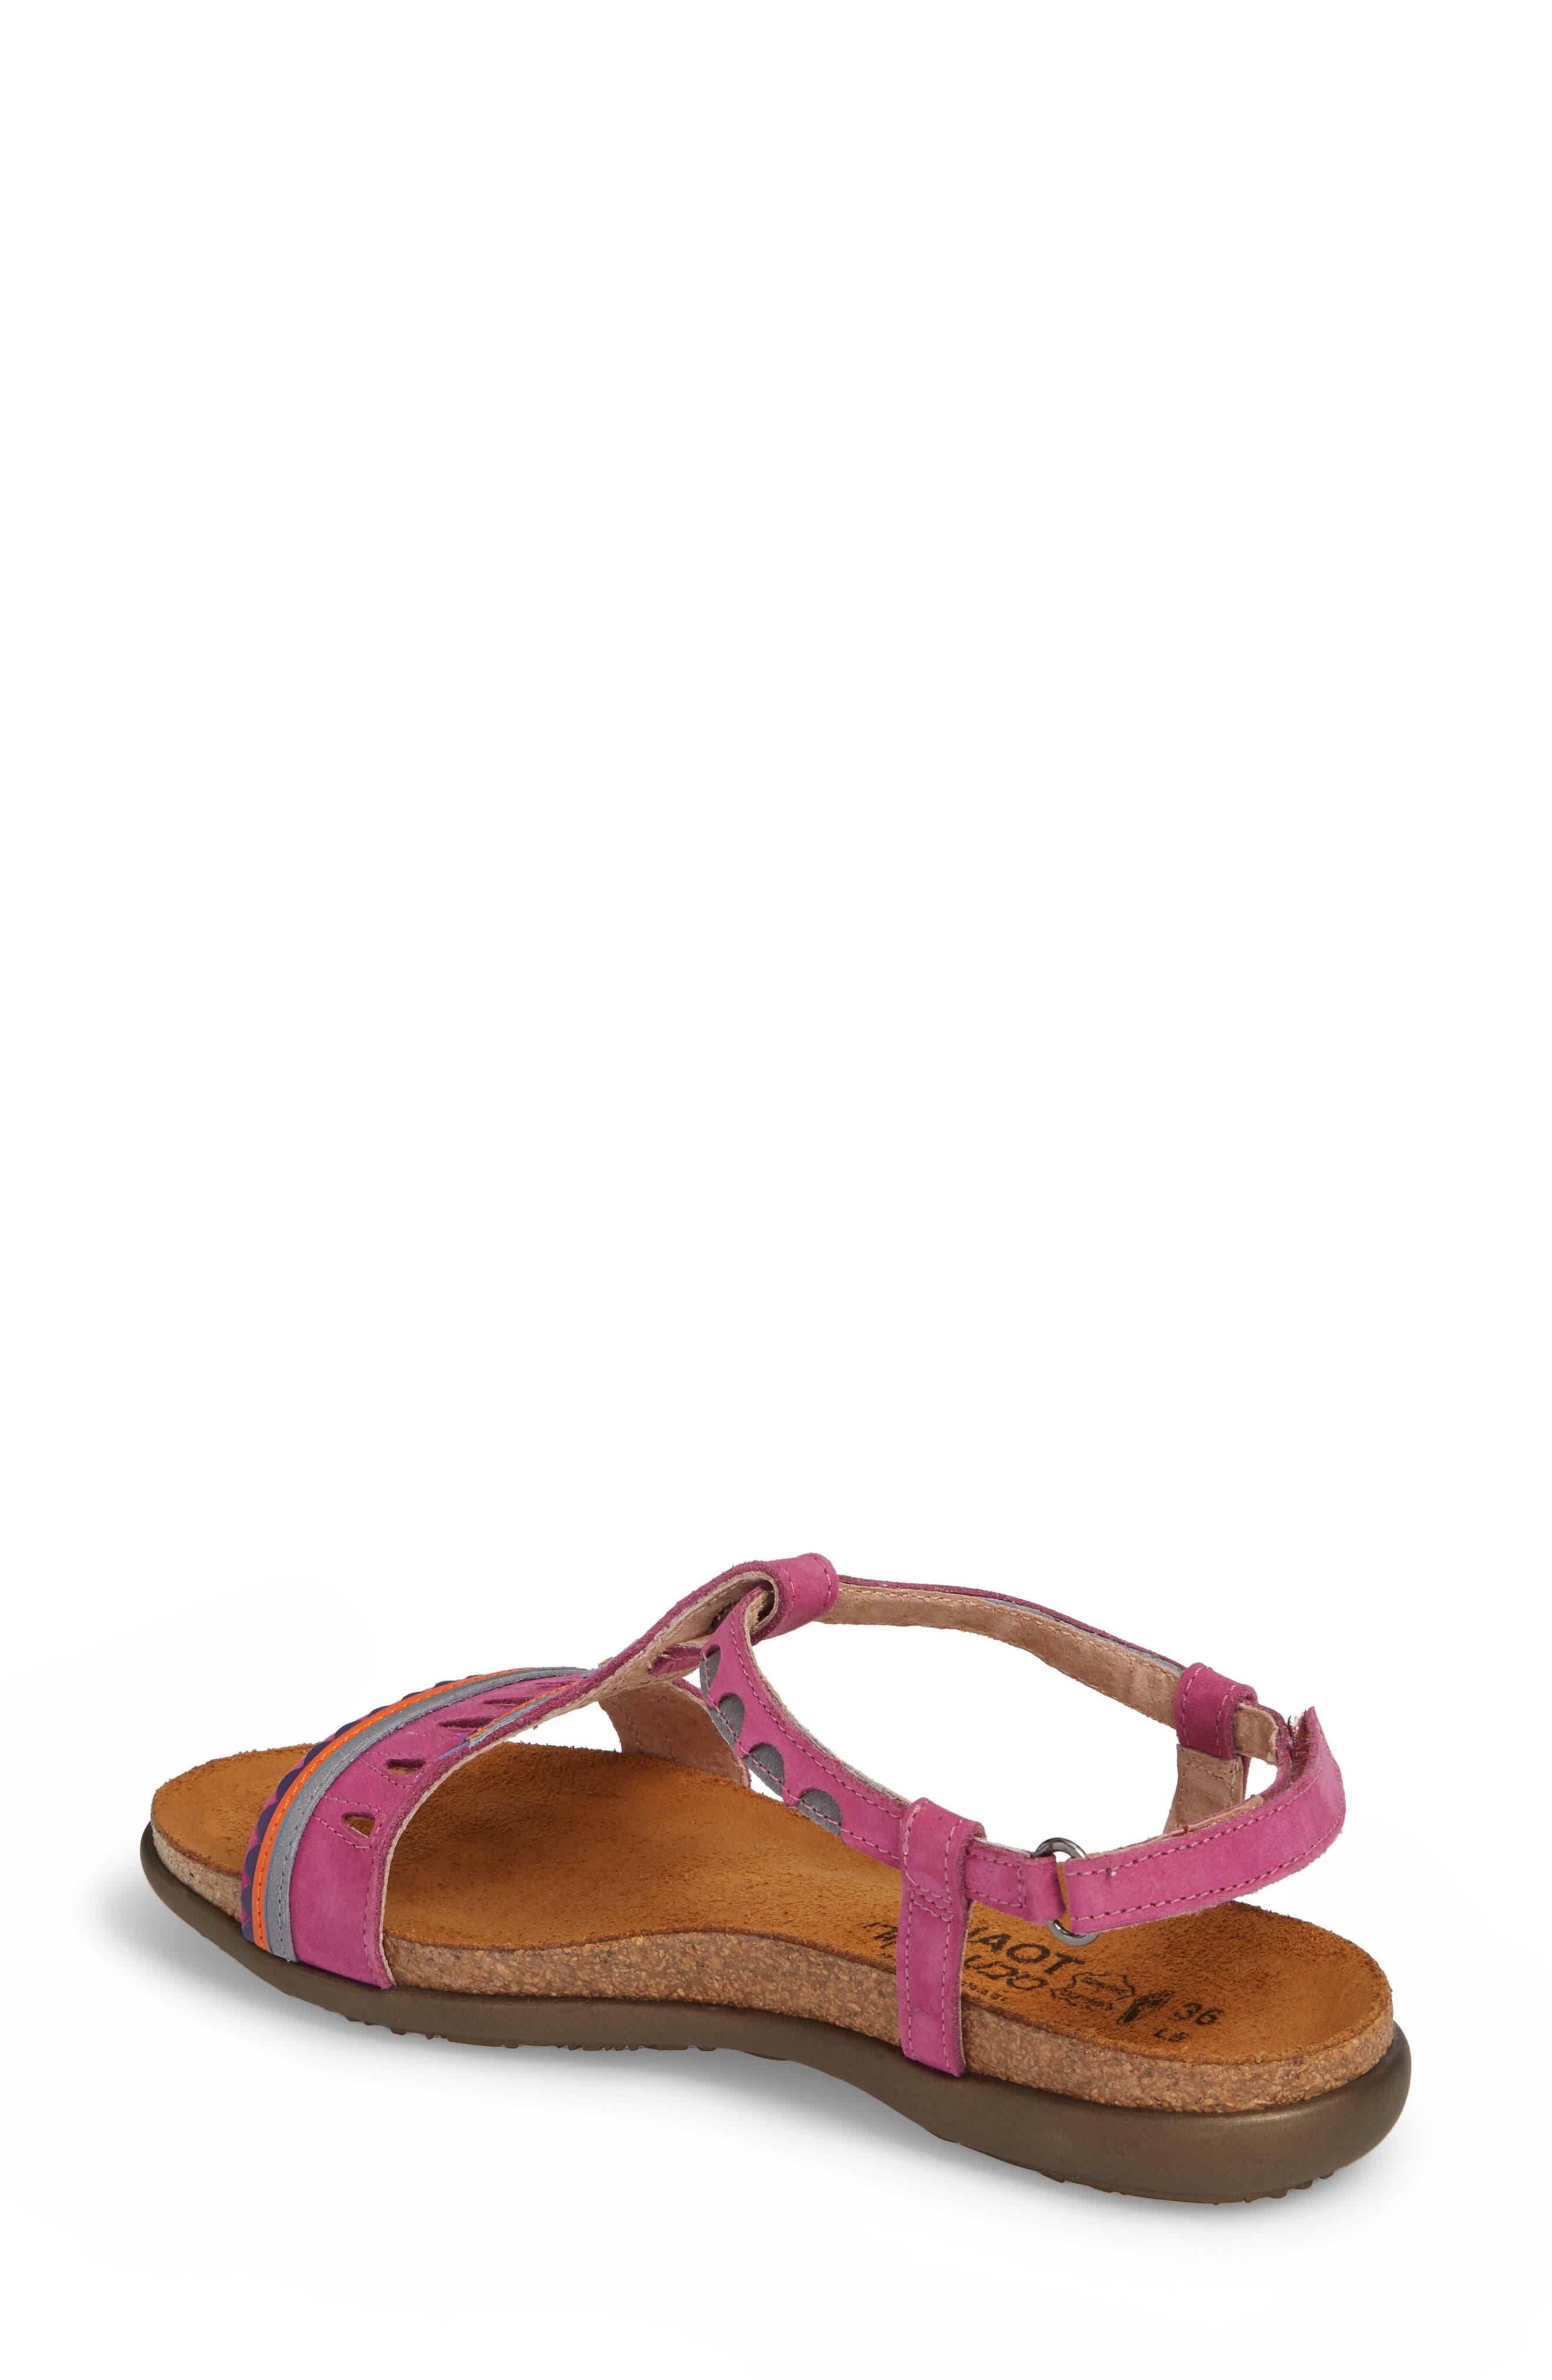 NAOT, Odelia Perforated T-Strap Sandal, Alternate thumbnail 2, color, PINK PLUM NUBUCK